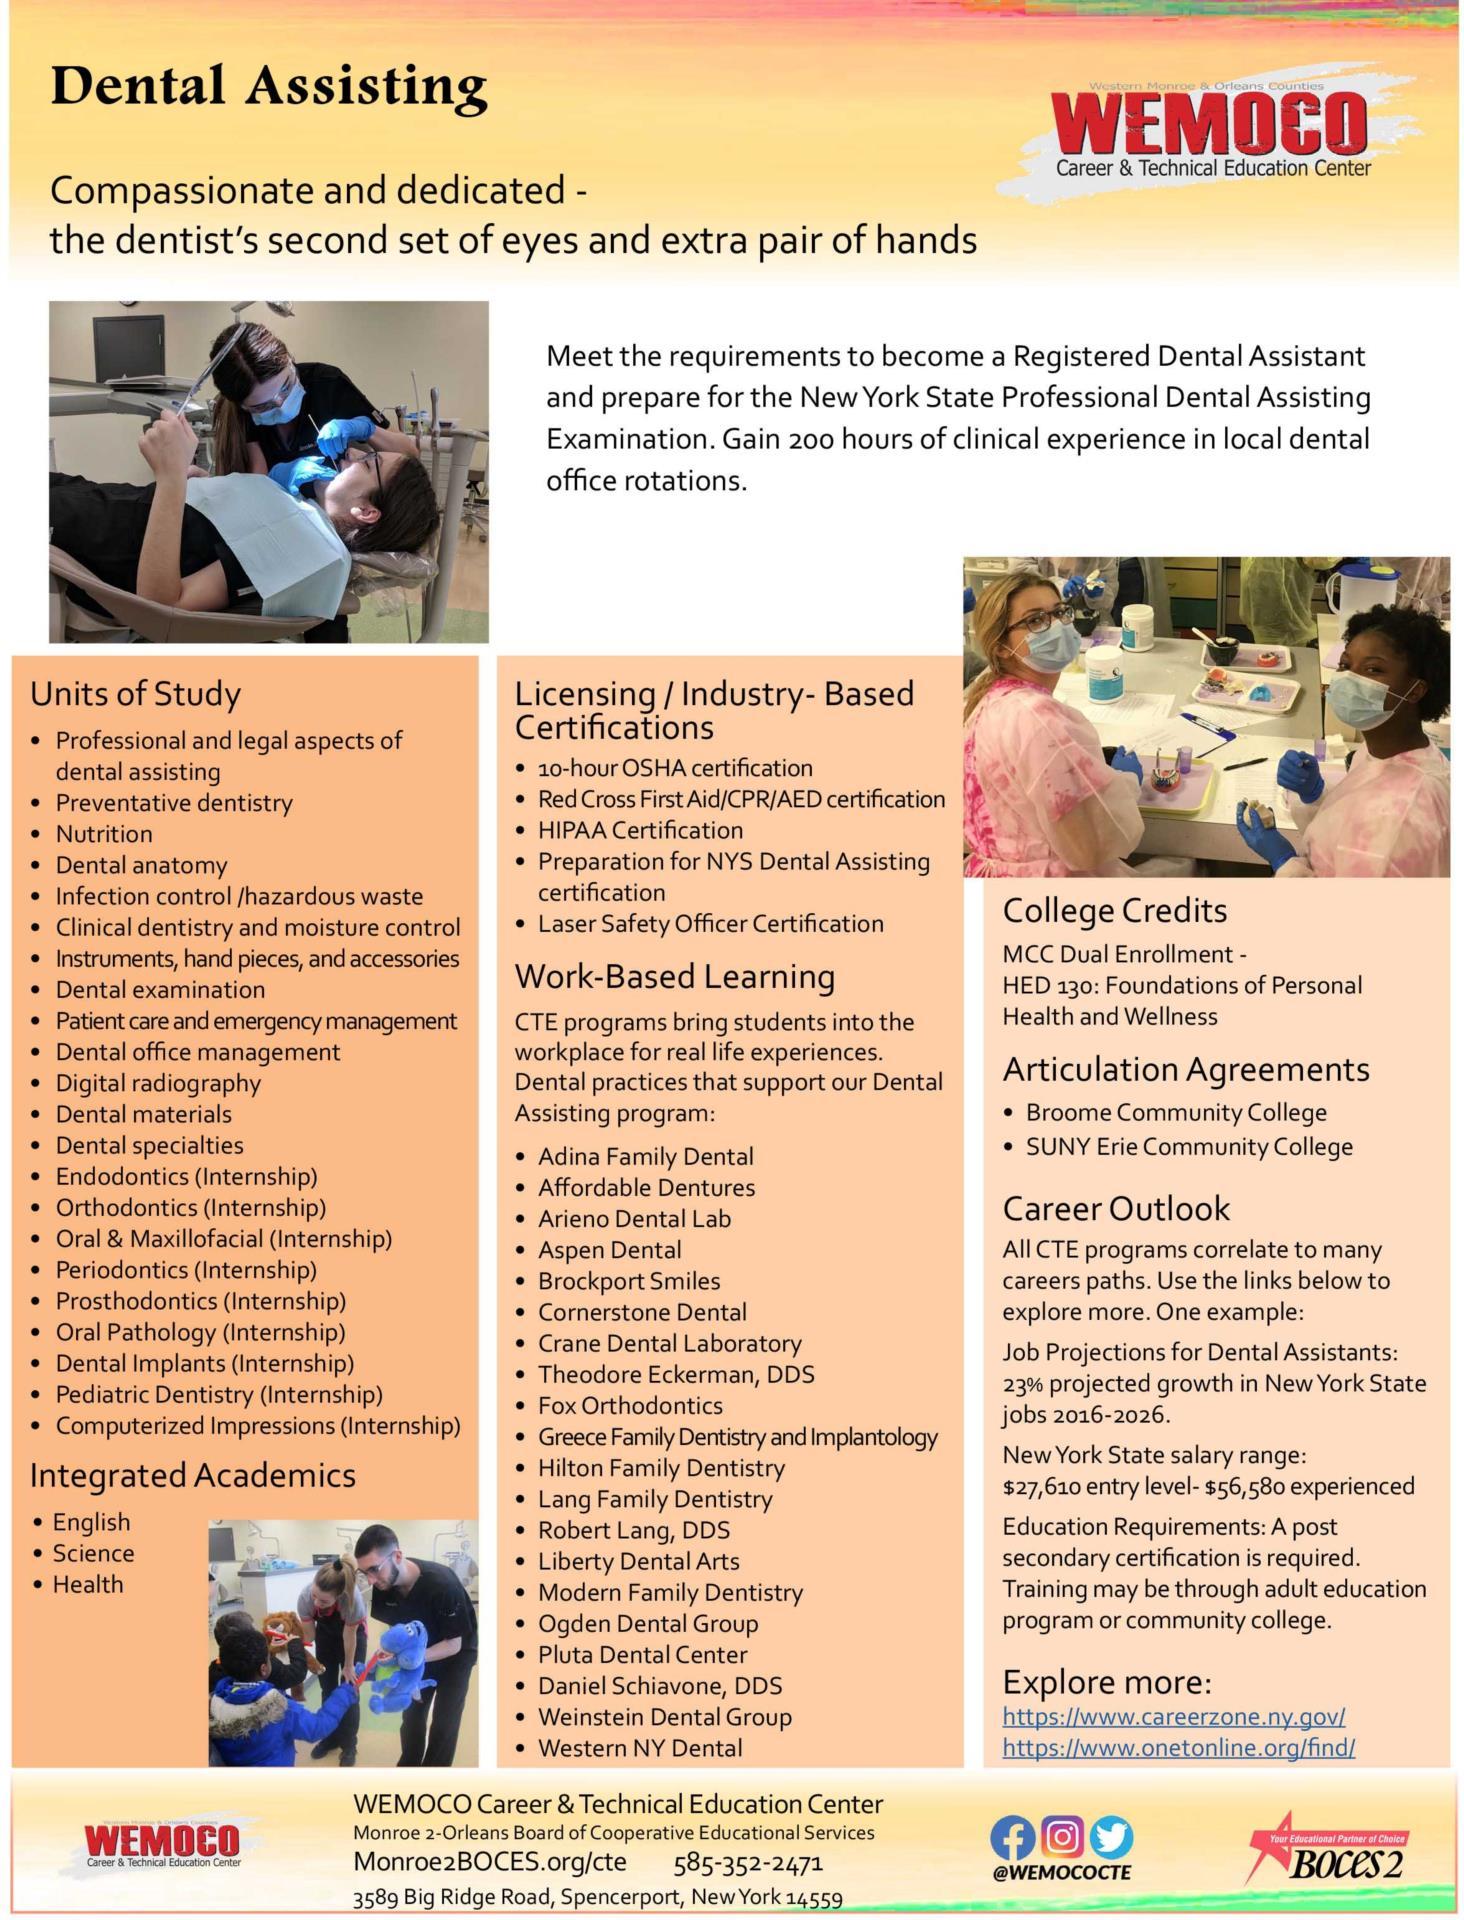 Download a PDF overview of the Dental Assisting program information